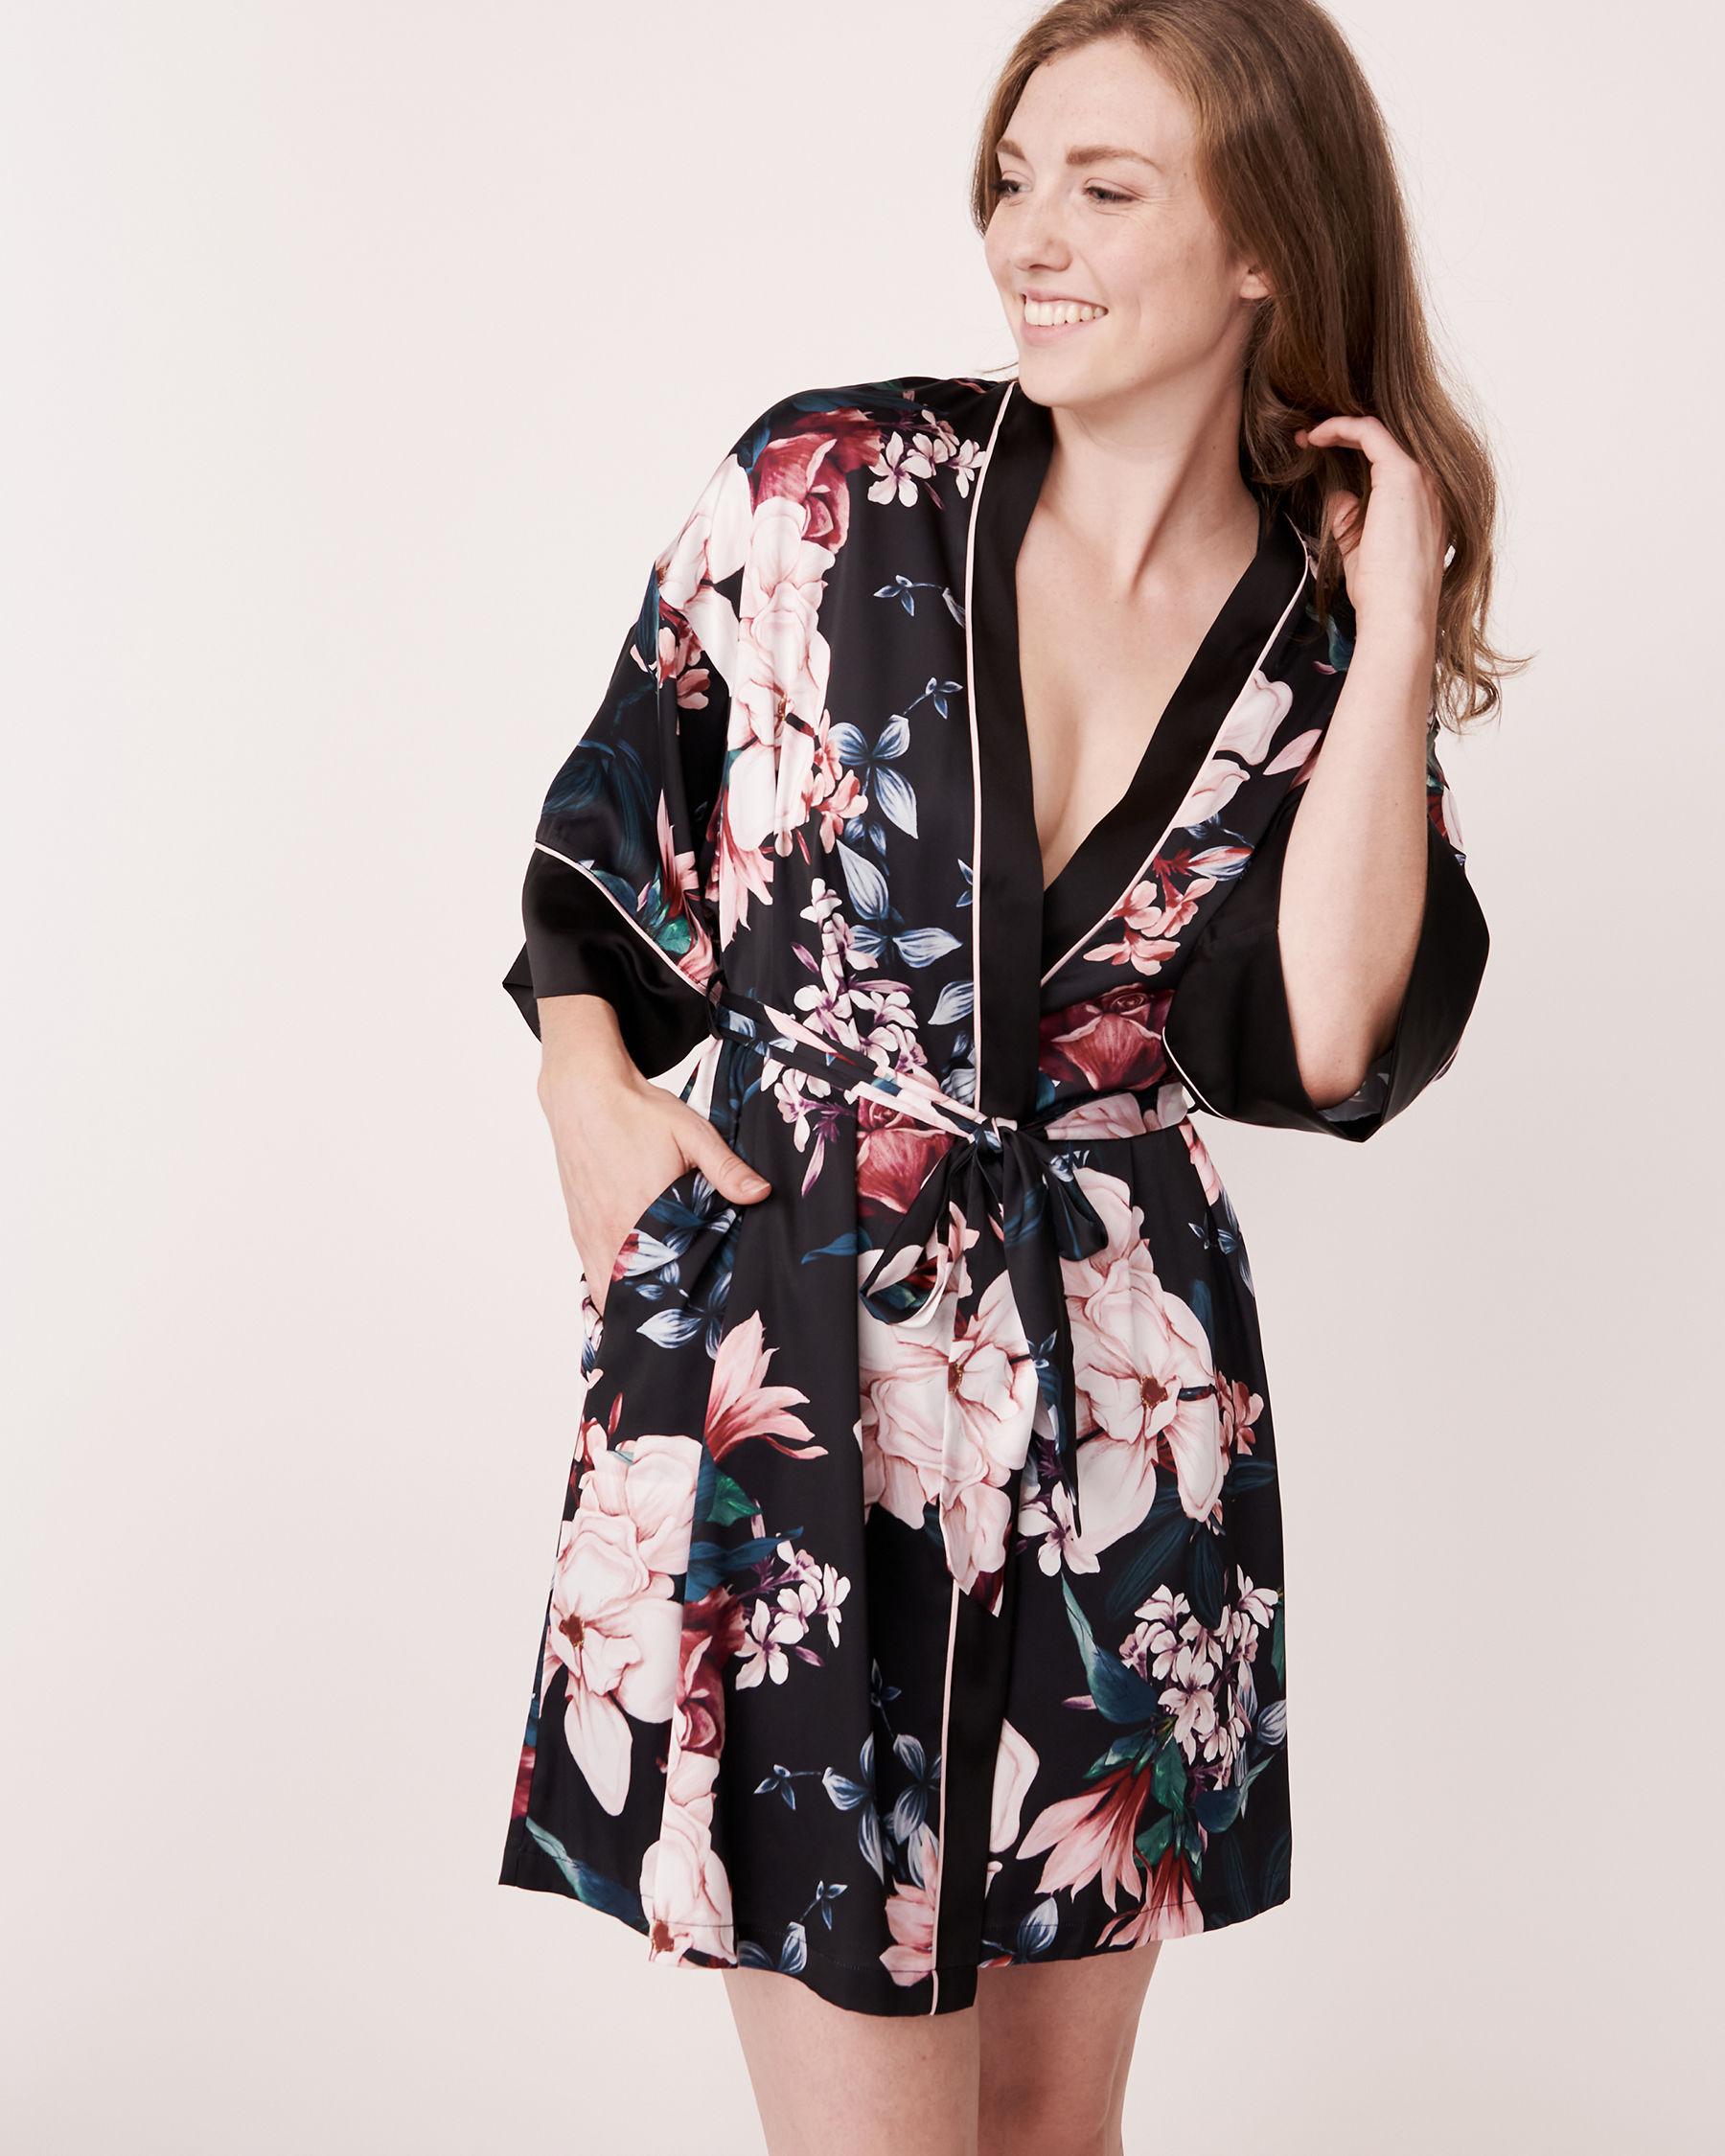 LA VIE EN ROSE Kimono en satin mat Noir 870-435-0-11 - Voir1